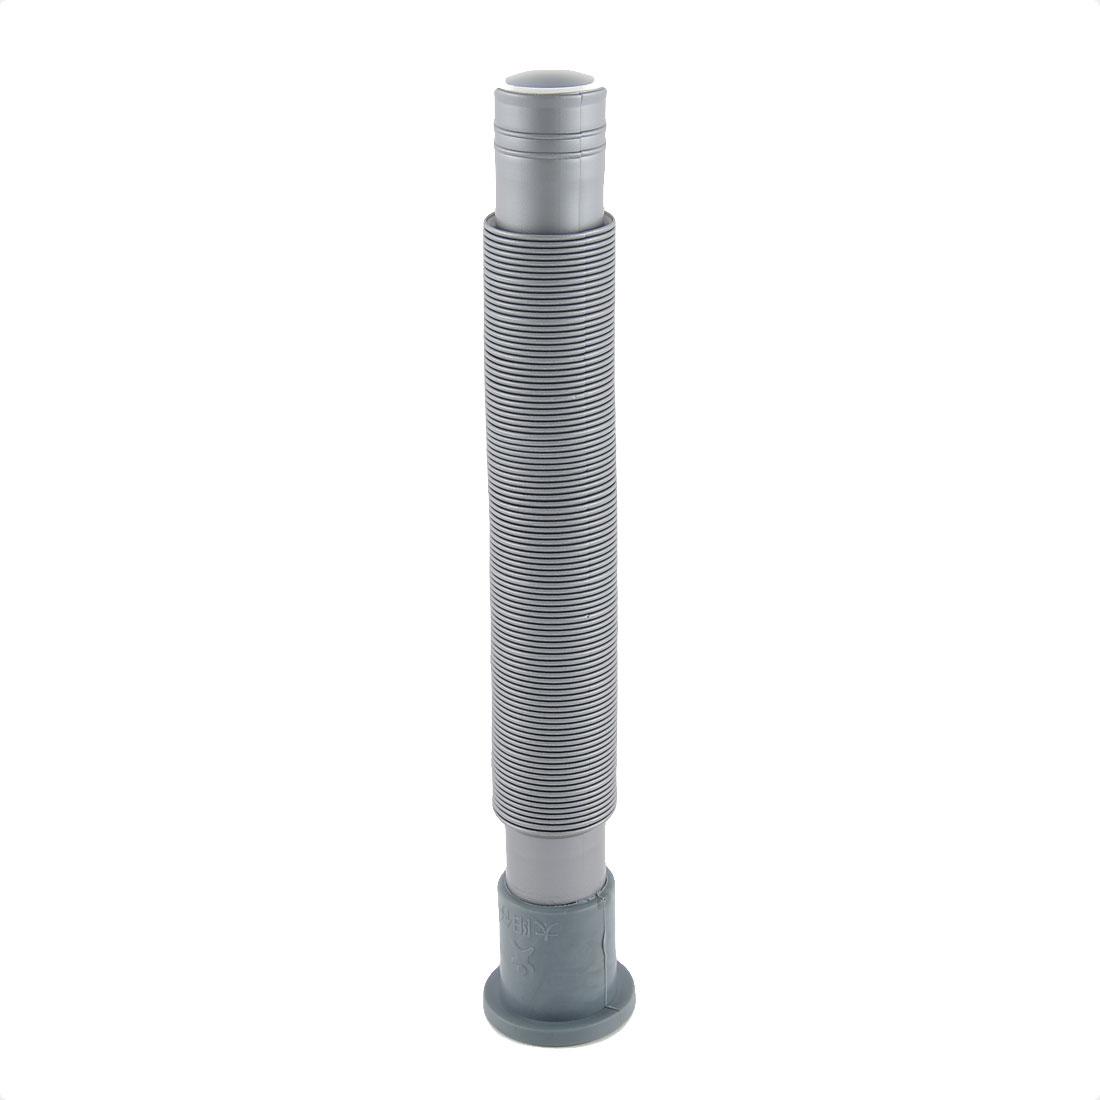 Kitchen Bathroom Plastic Sink Pedestal Basin Flexible Drain Hose Tube Pipe